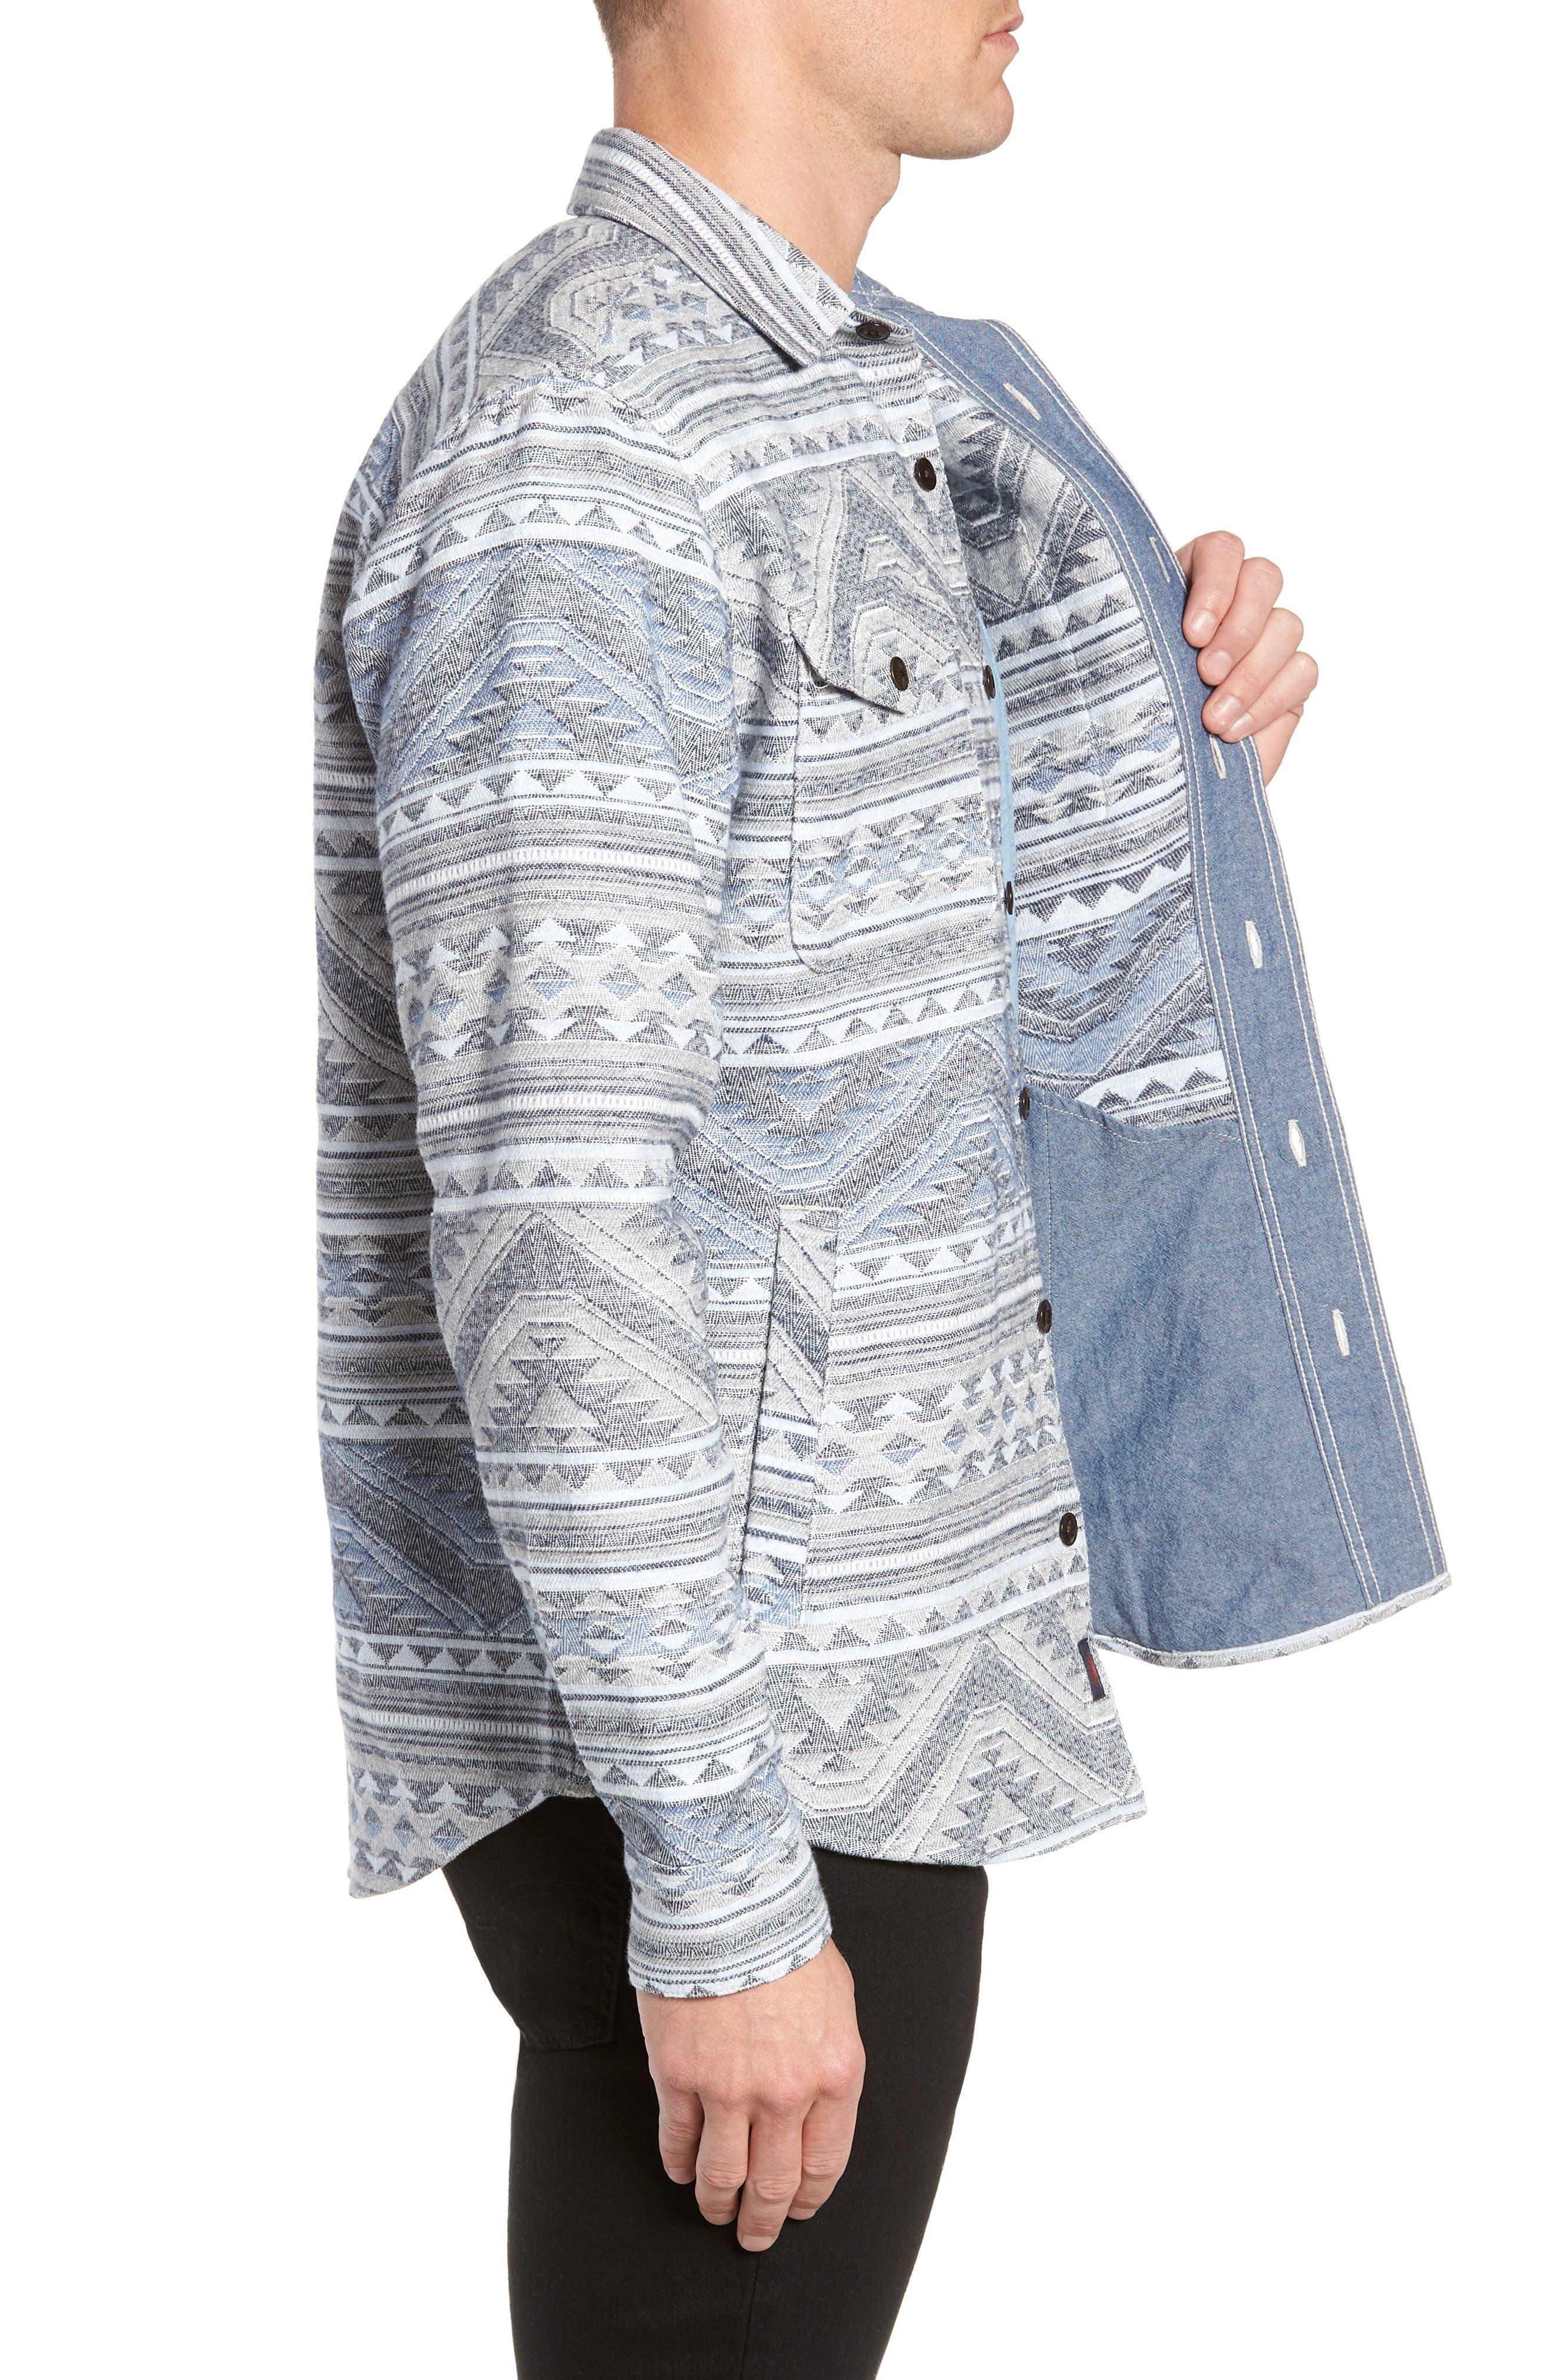 Durango CPO Cotton Work Shirt,                             Alternate thumbnail 3, color,                             TWILIGHT GLACIER